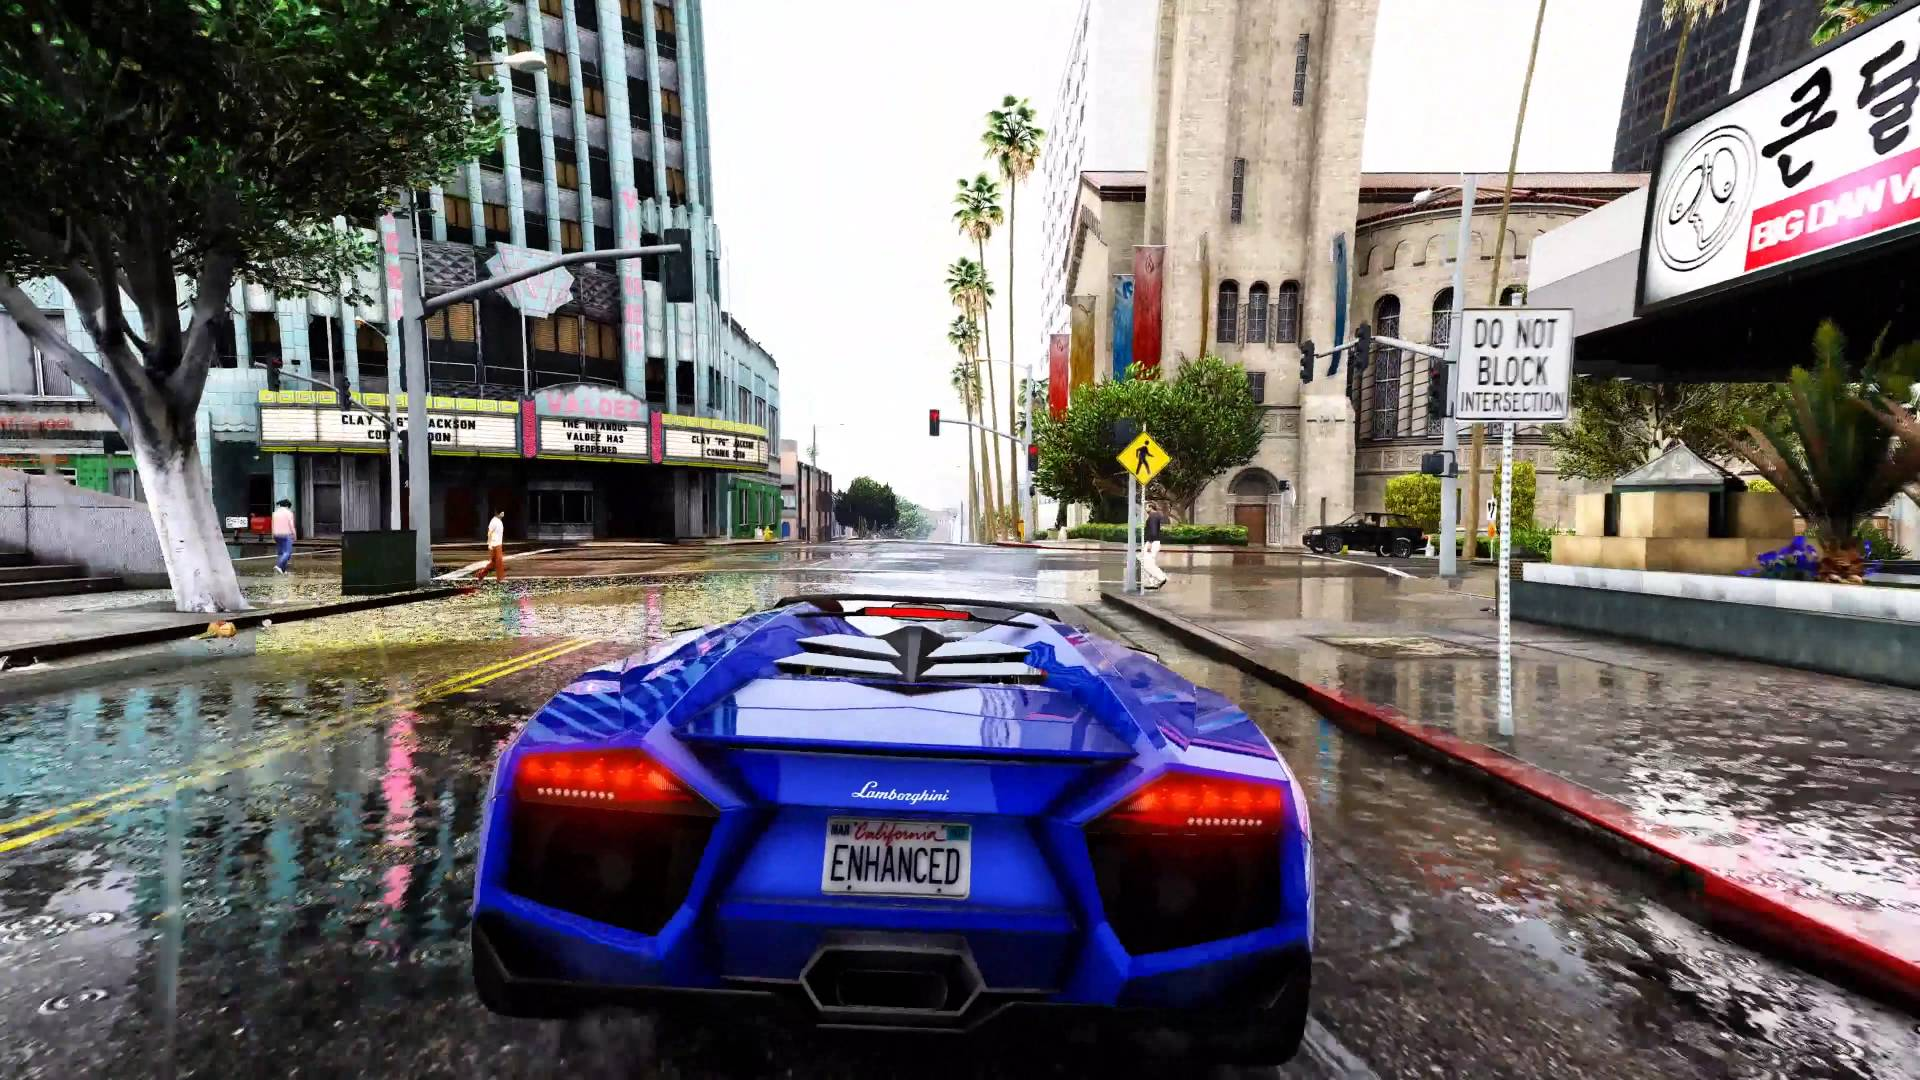 Grand theft auto 5 online release date in Australia